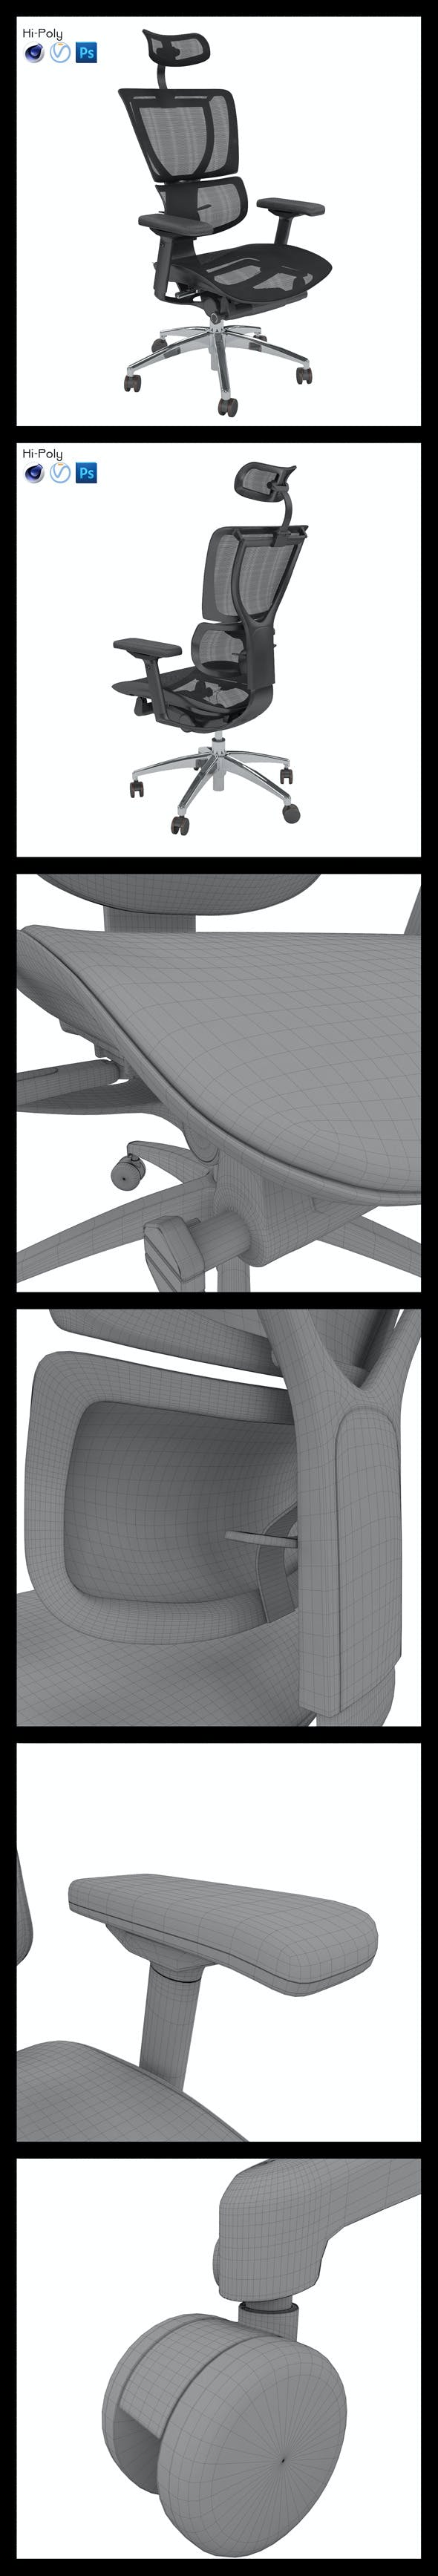 AlbaCR JOO Hi-Poly - 3DOcean Item for Sale